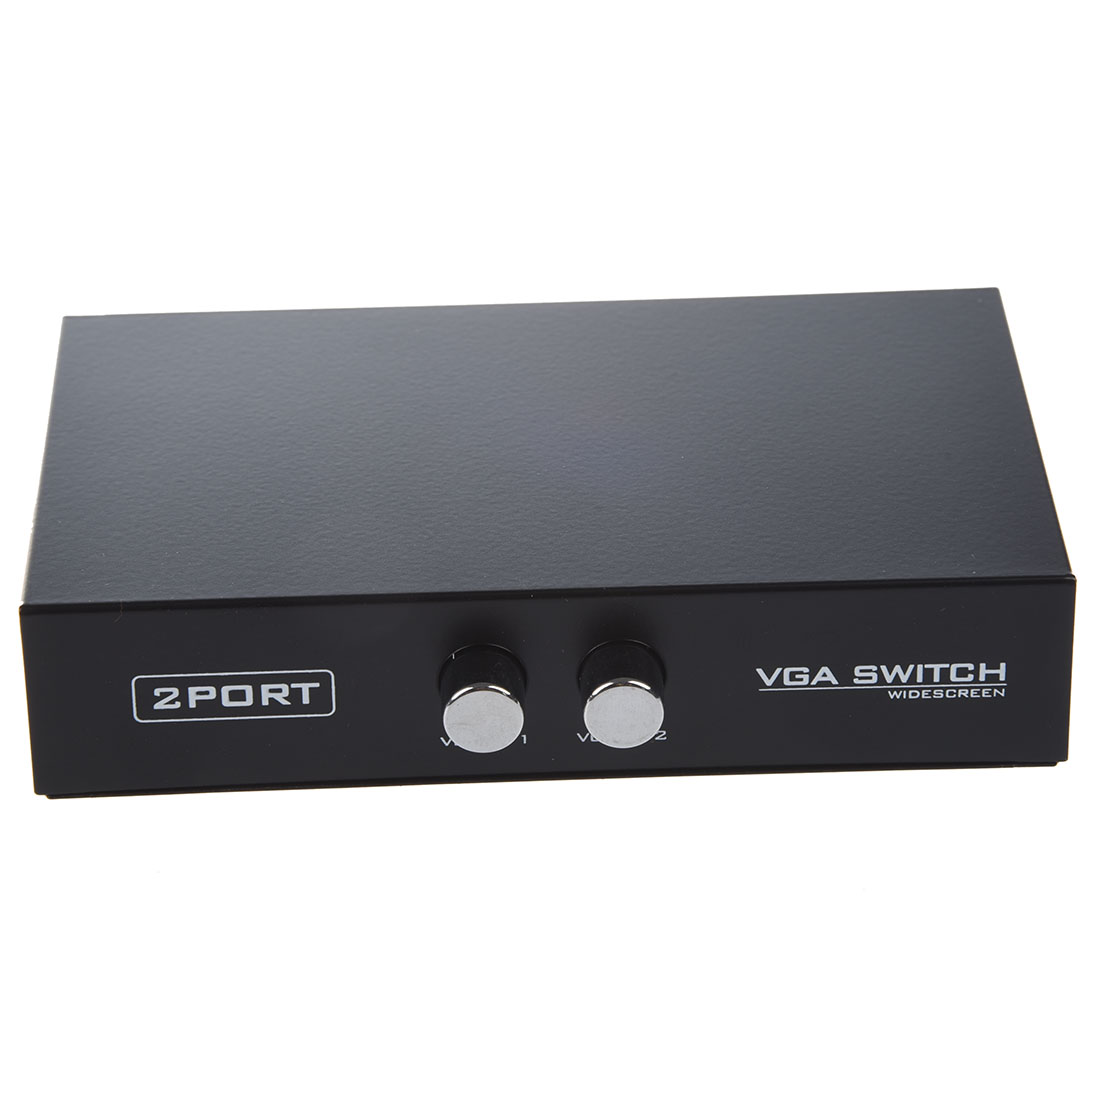 Round Press Button Two Way VGA Switch Splitter Black